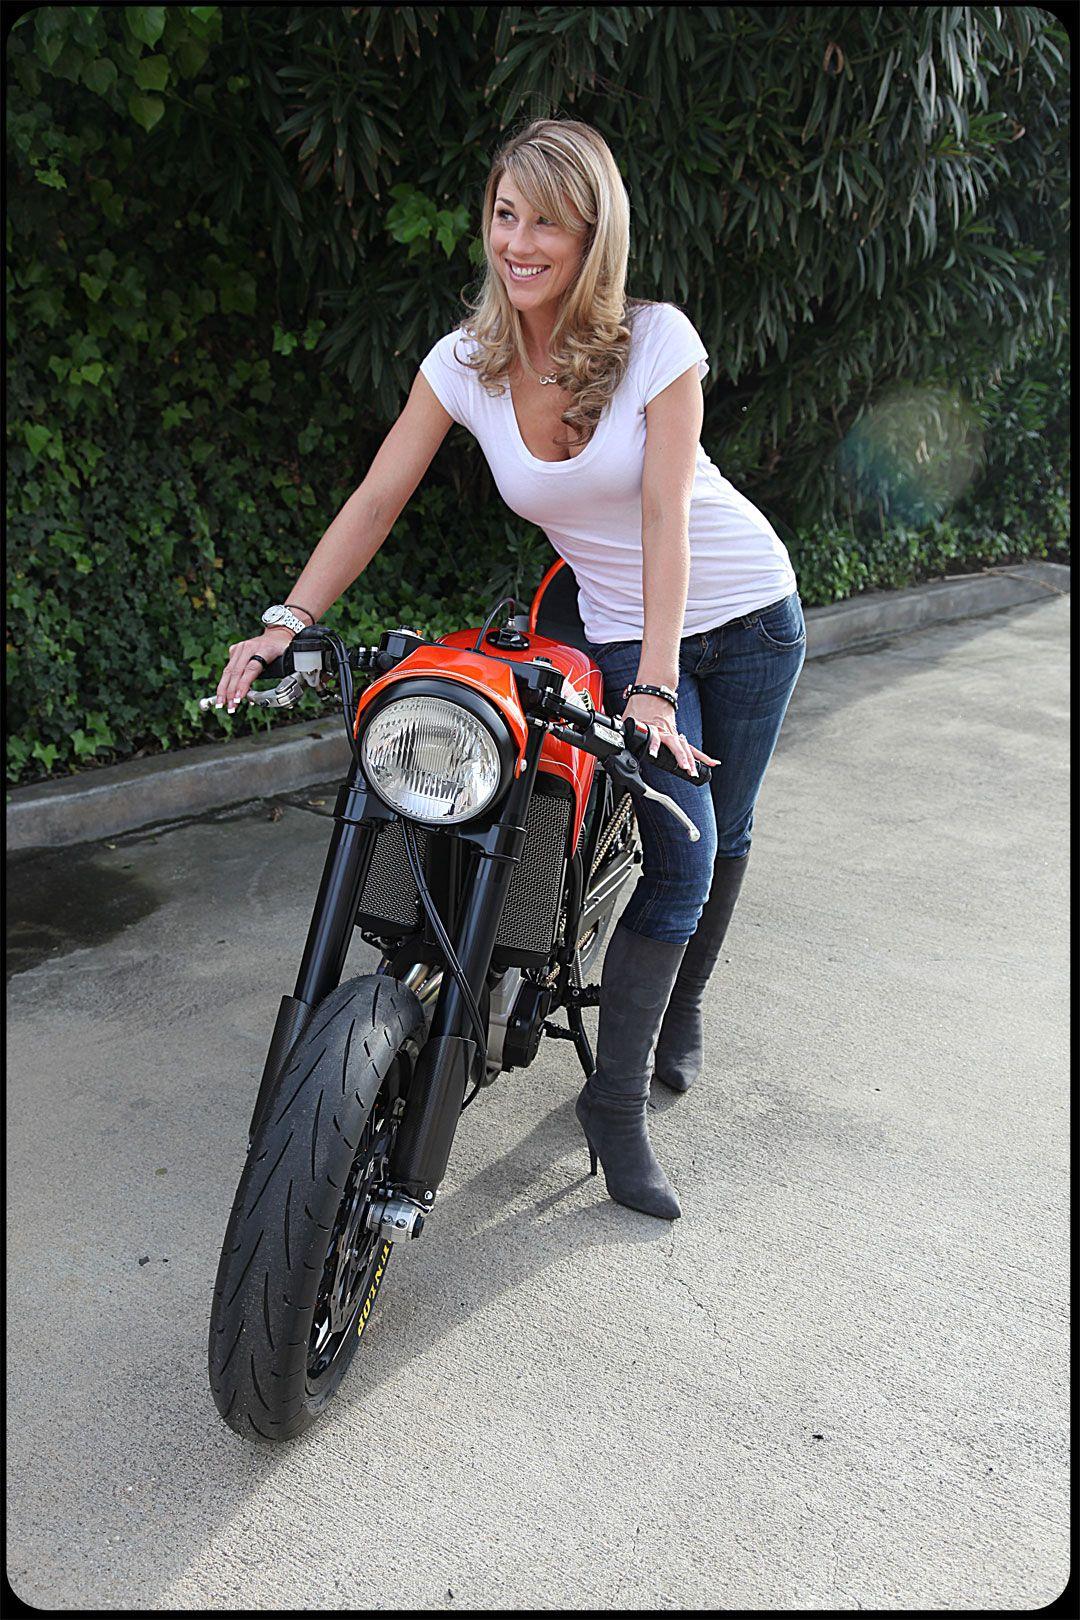 Ktm Motard Cafe Racer Cafe Racer Girl Motorcycle Girl Biker Girl